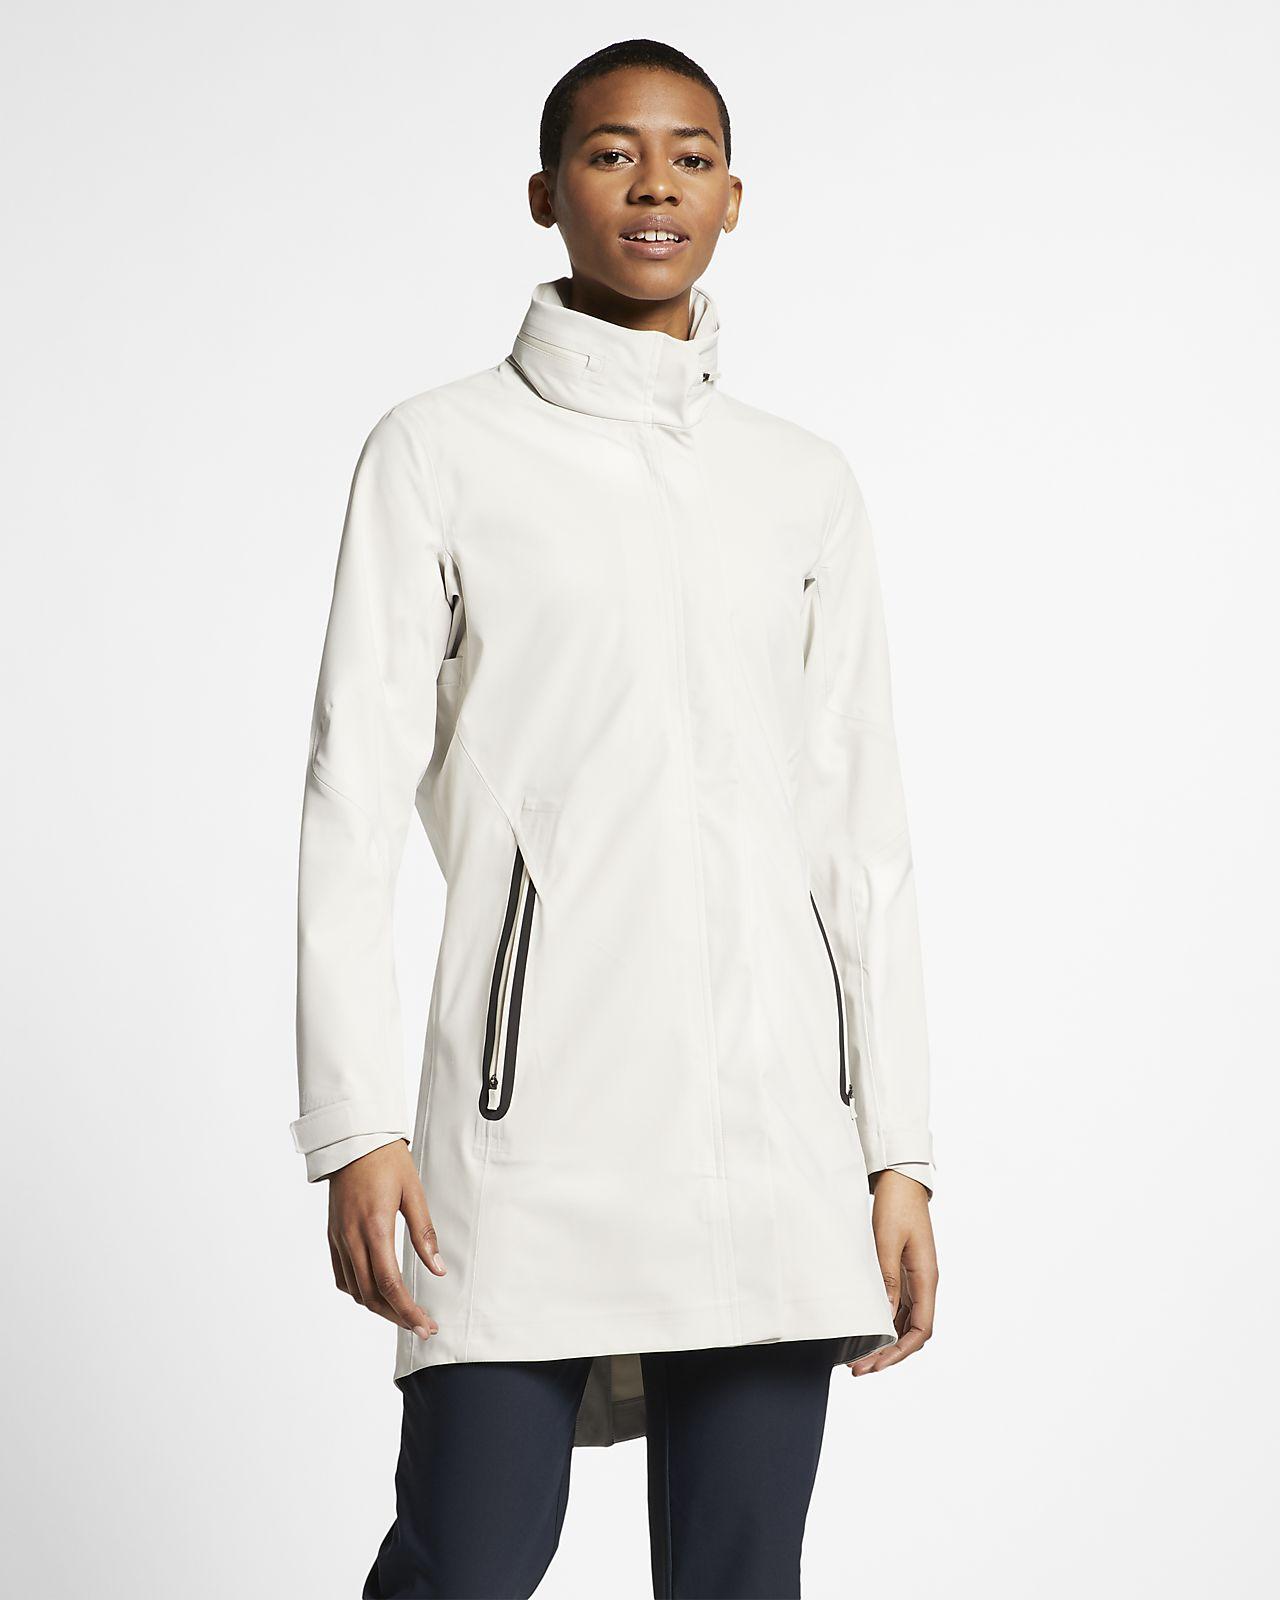 Nike HyperAdapt Women's Golf Jacket